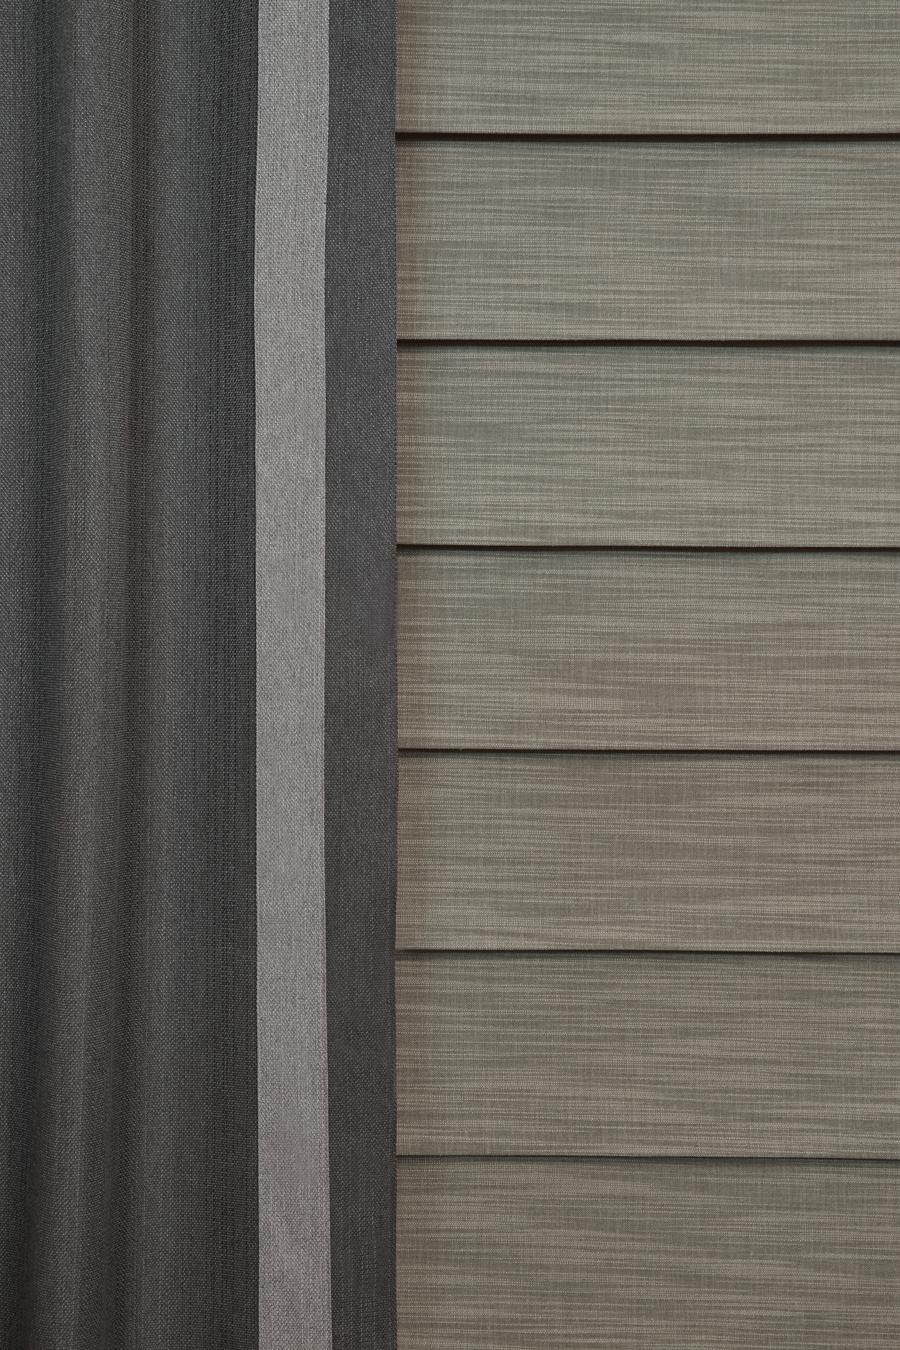 room darkening shades with side drapery panels Austin TX